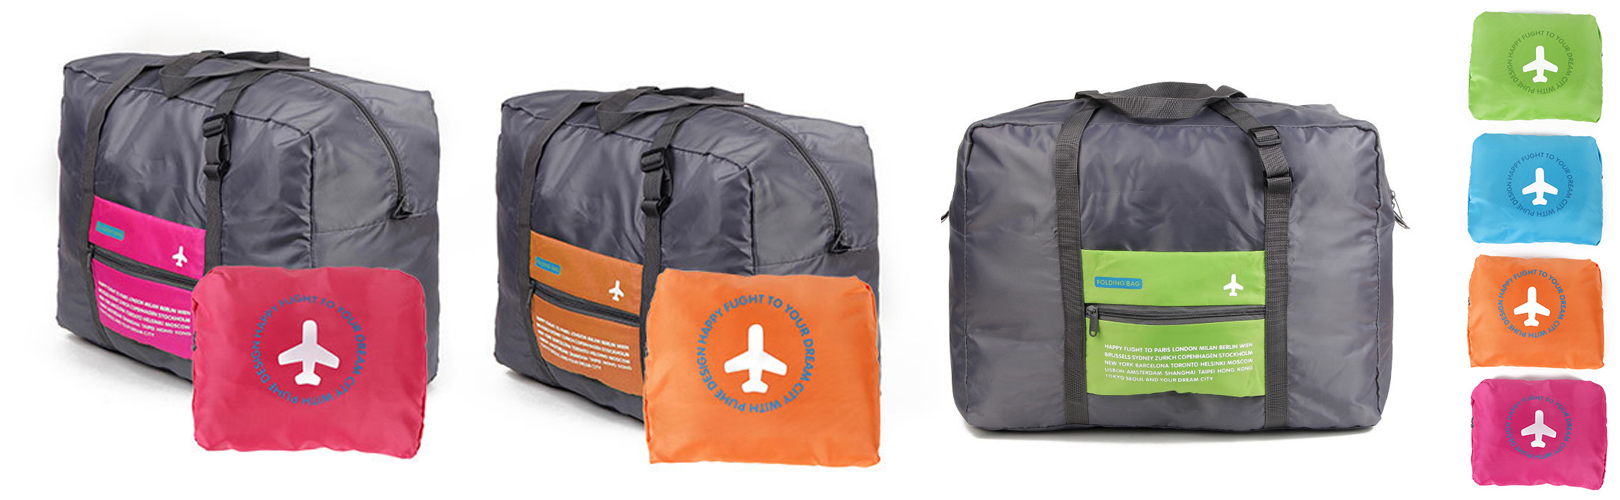 Fashionable WaterProof Travel Bag